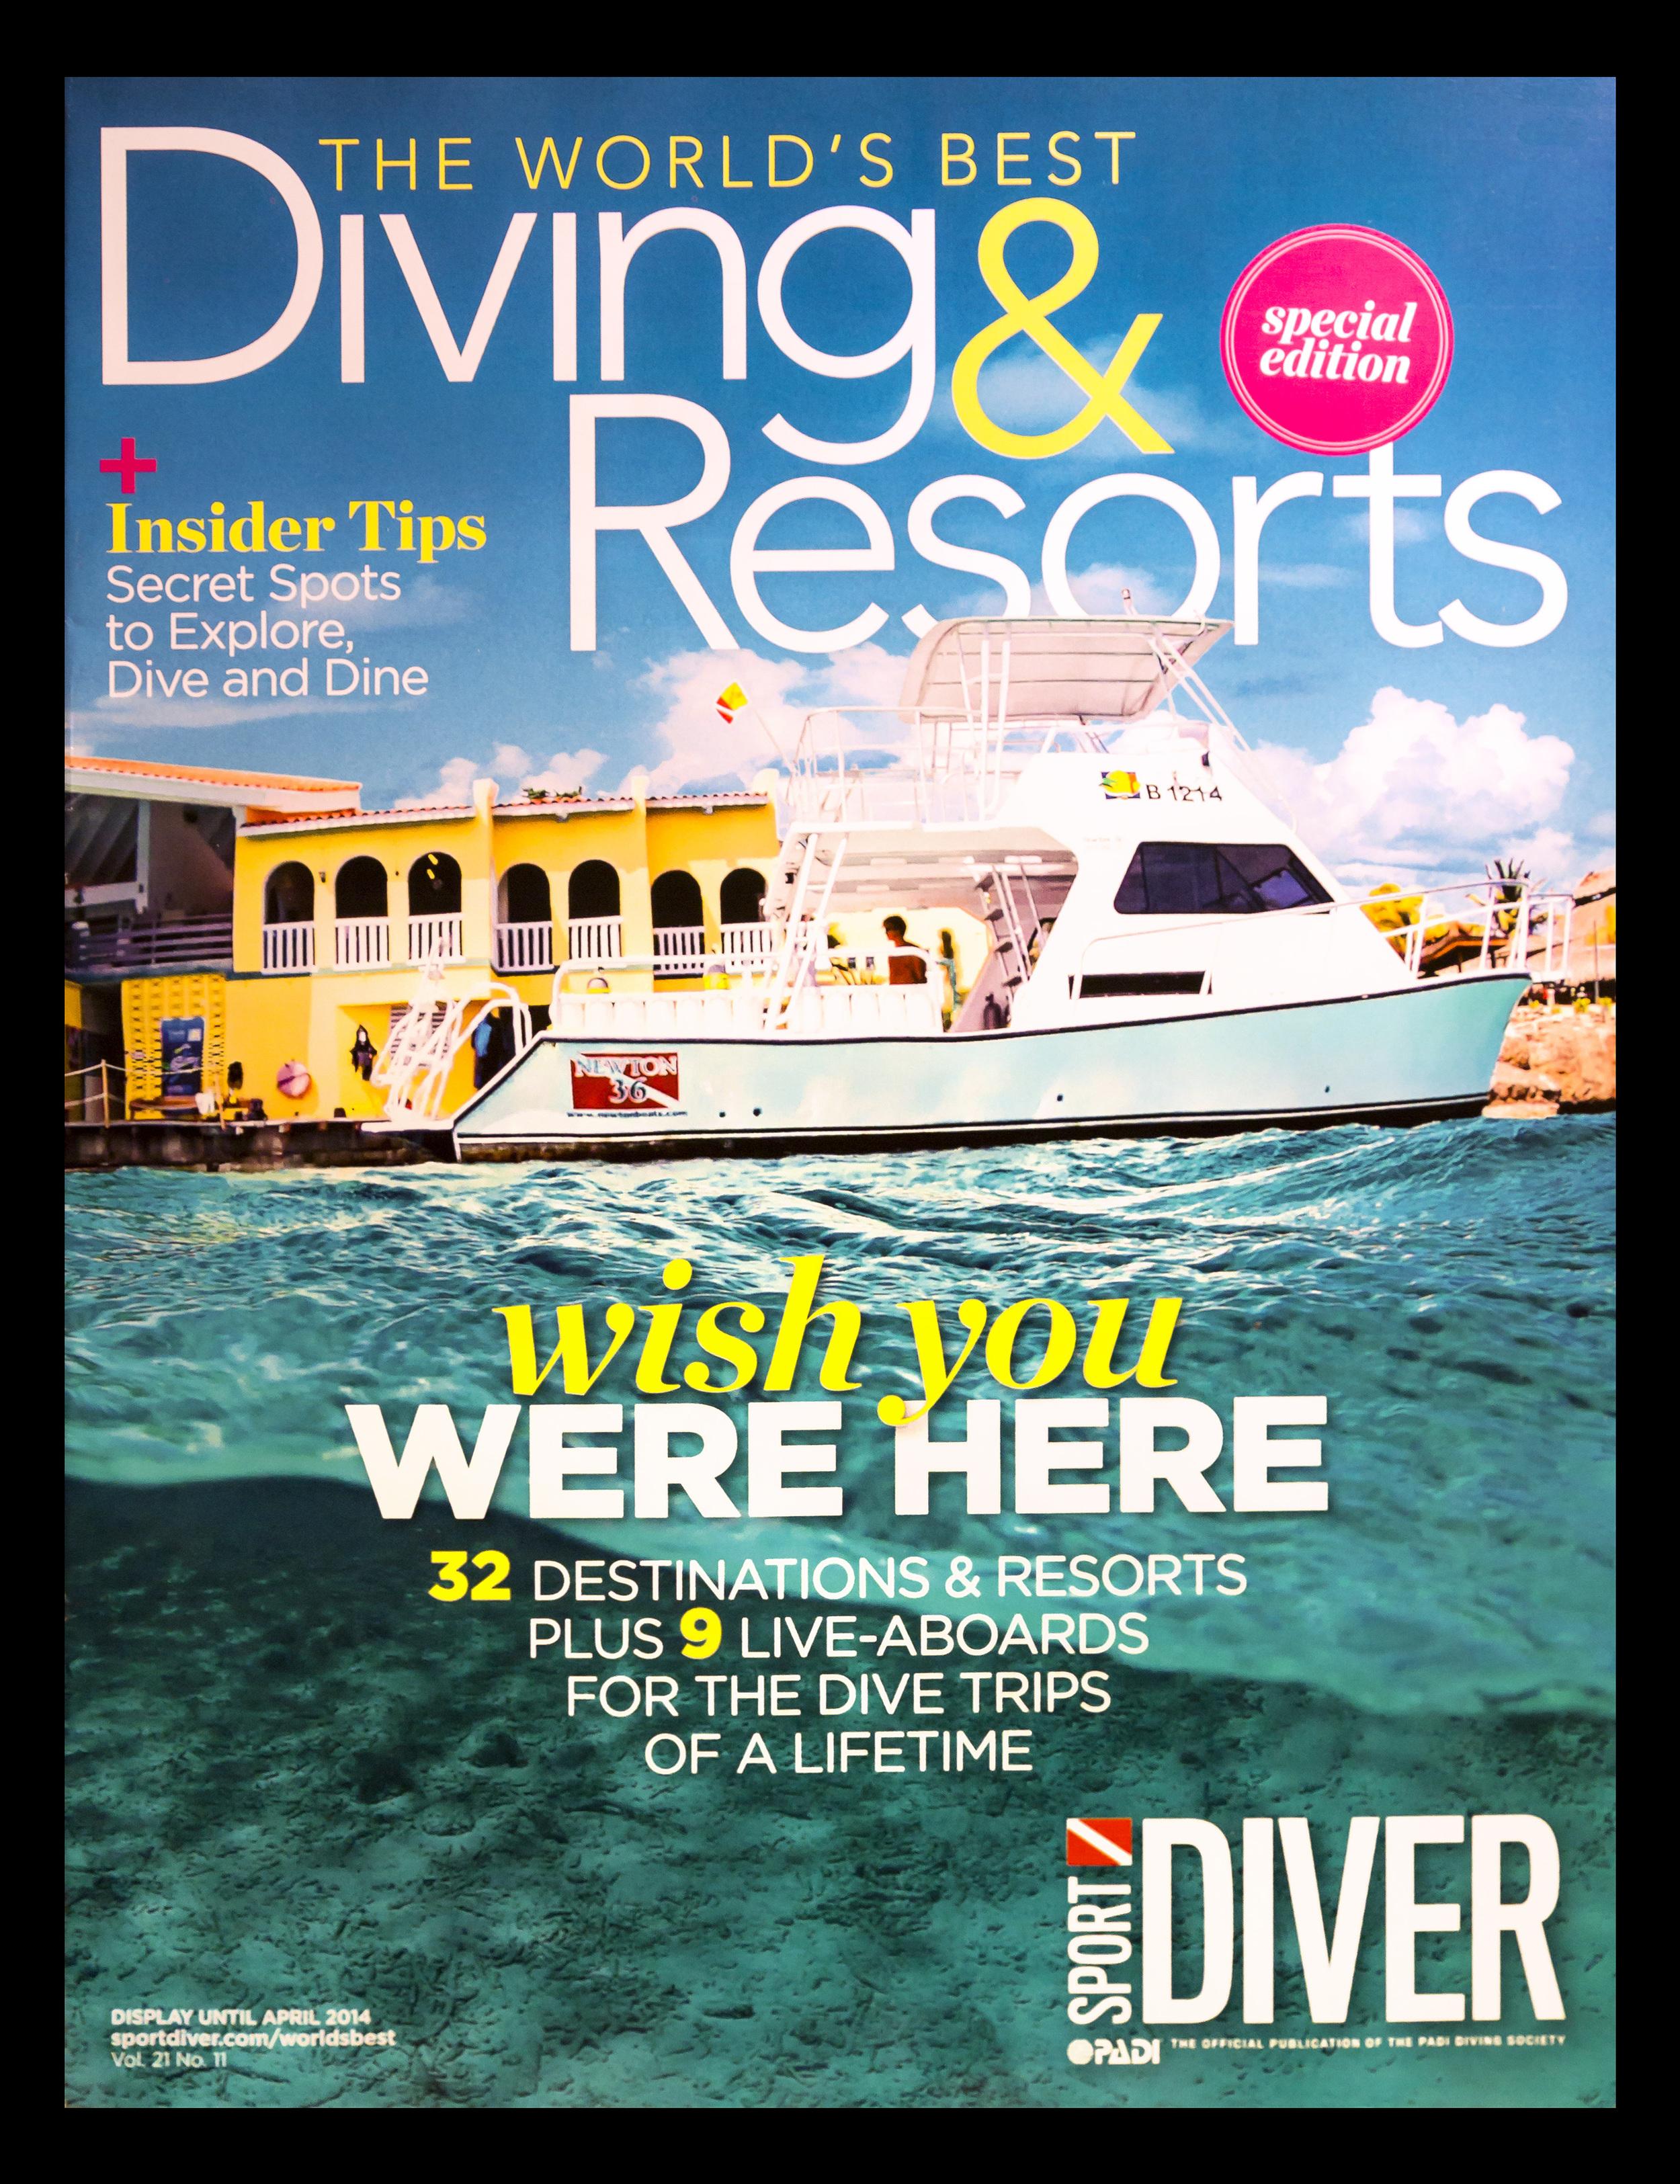 Beth Watson's cover shot Sport Diver Magazine.